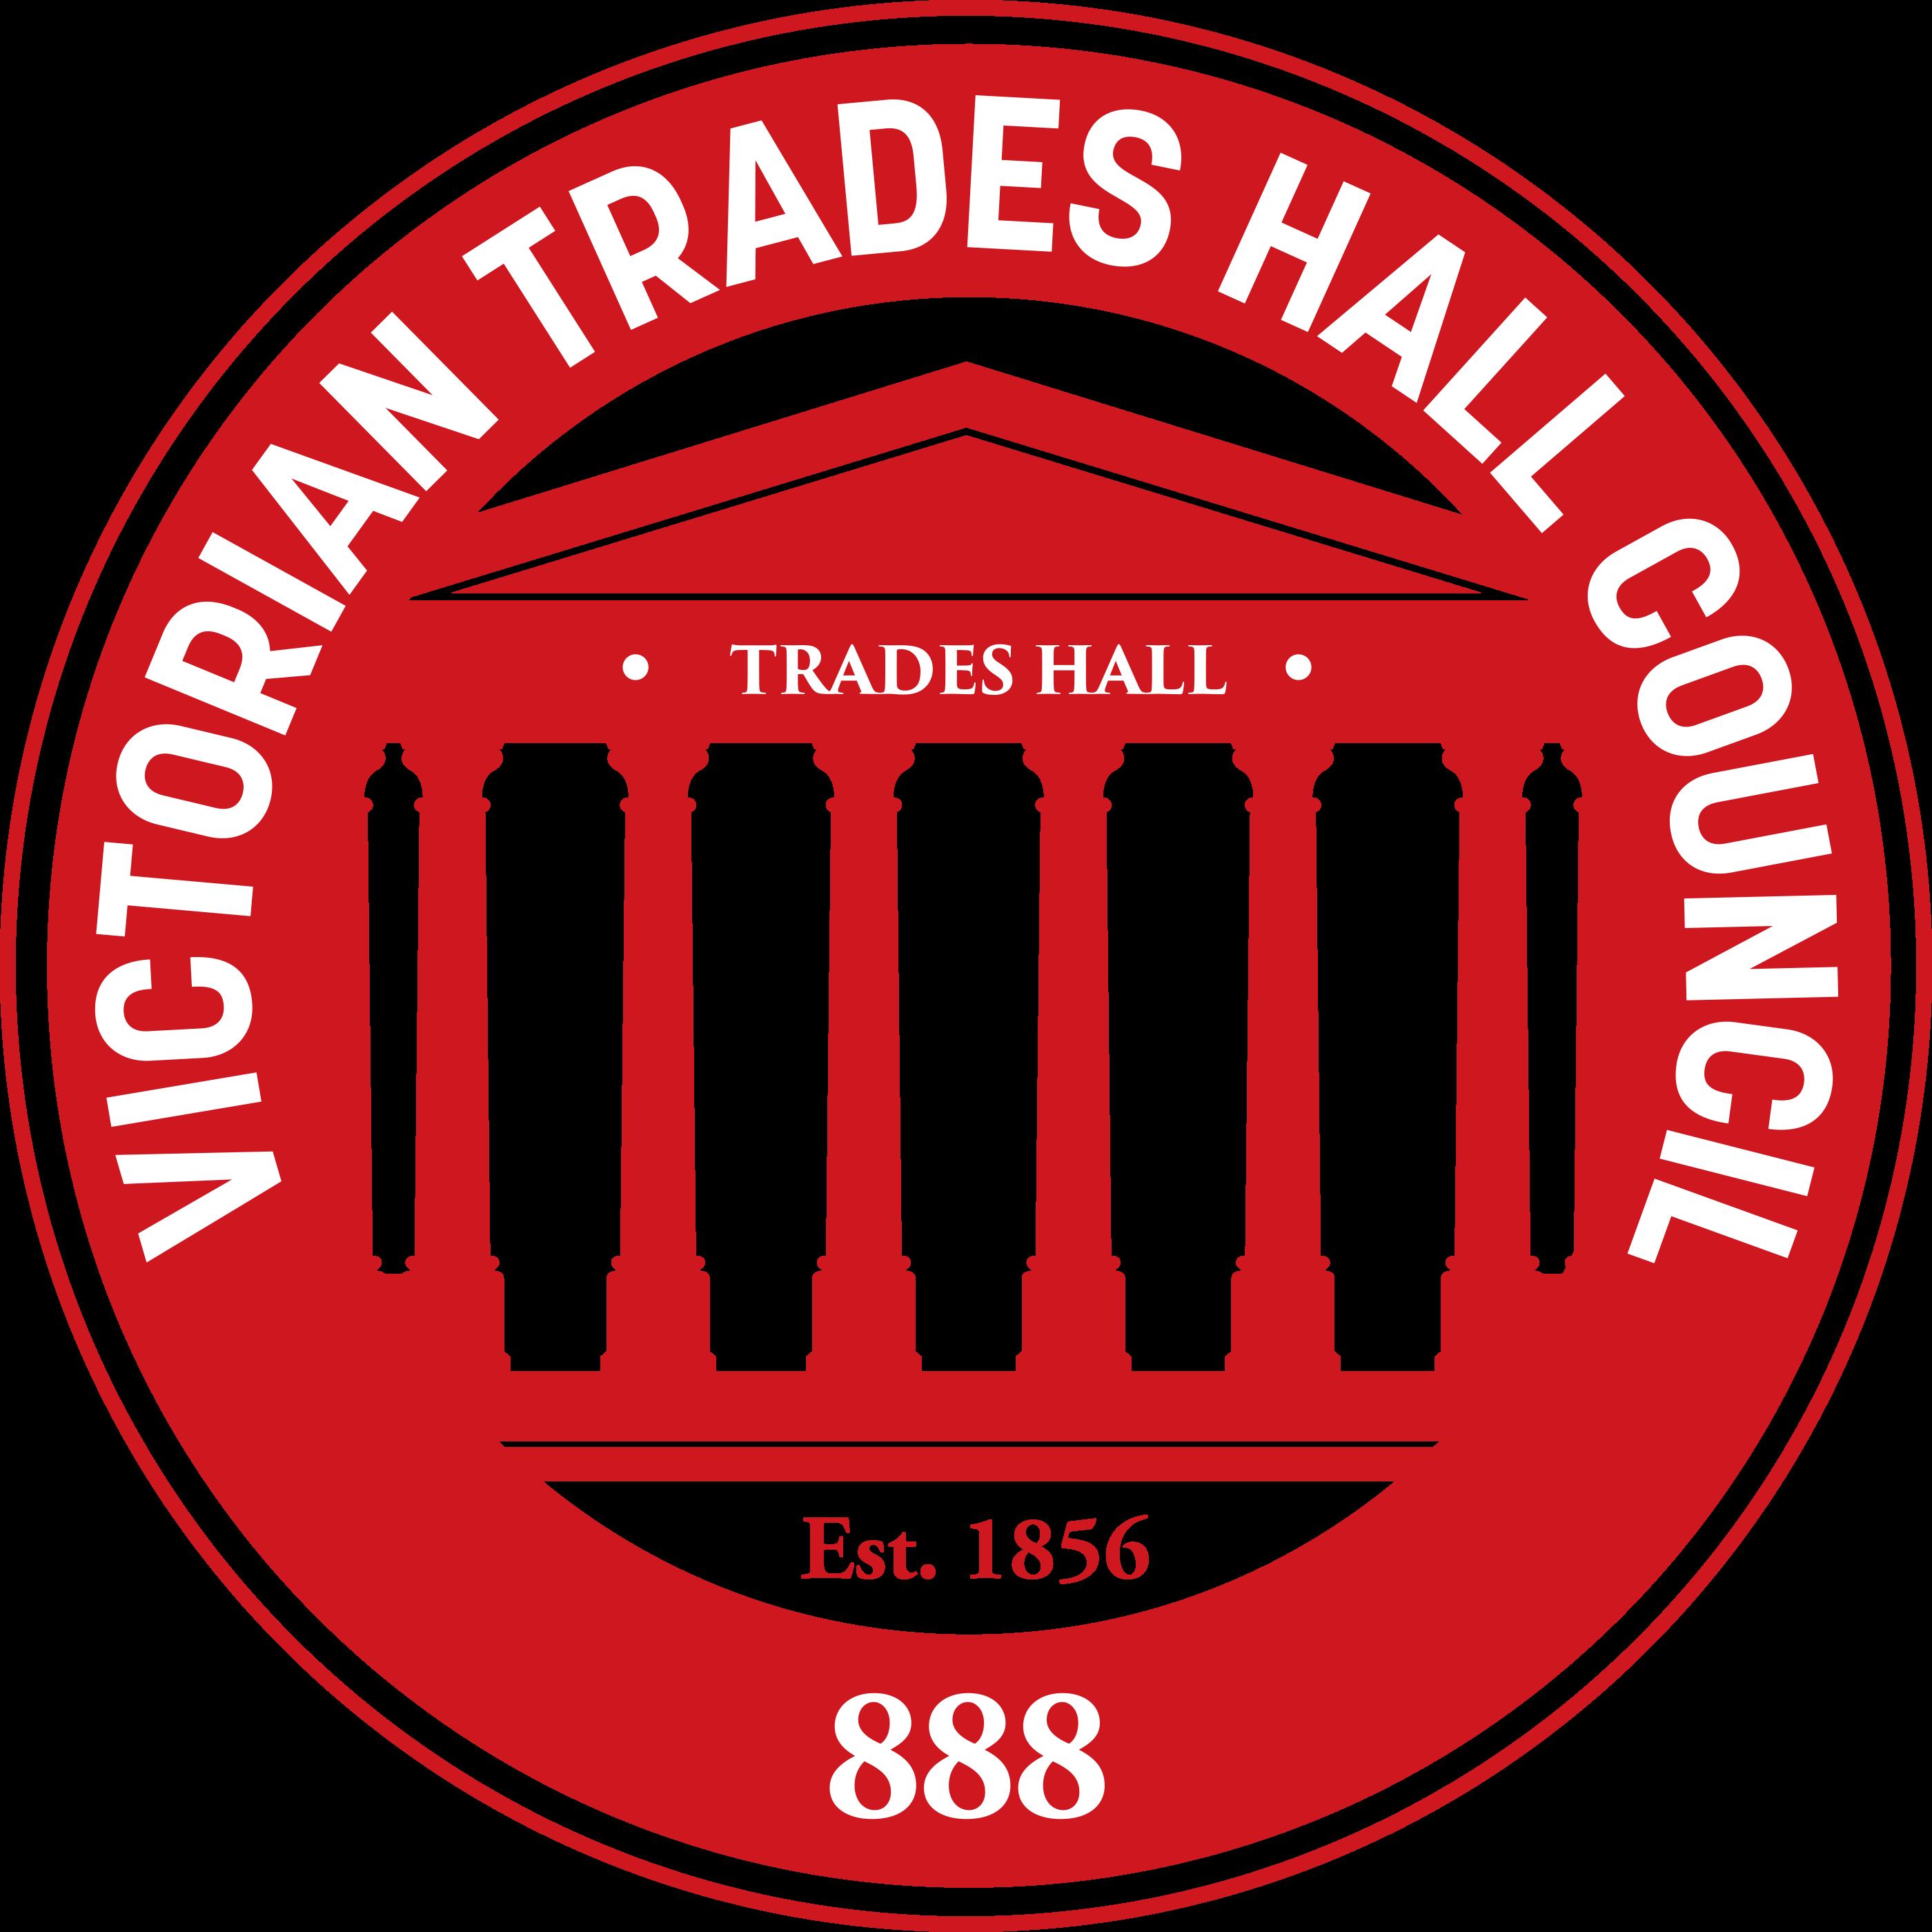 VTHC_logo.png